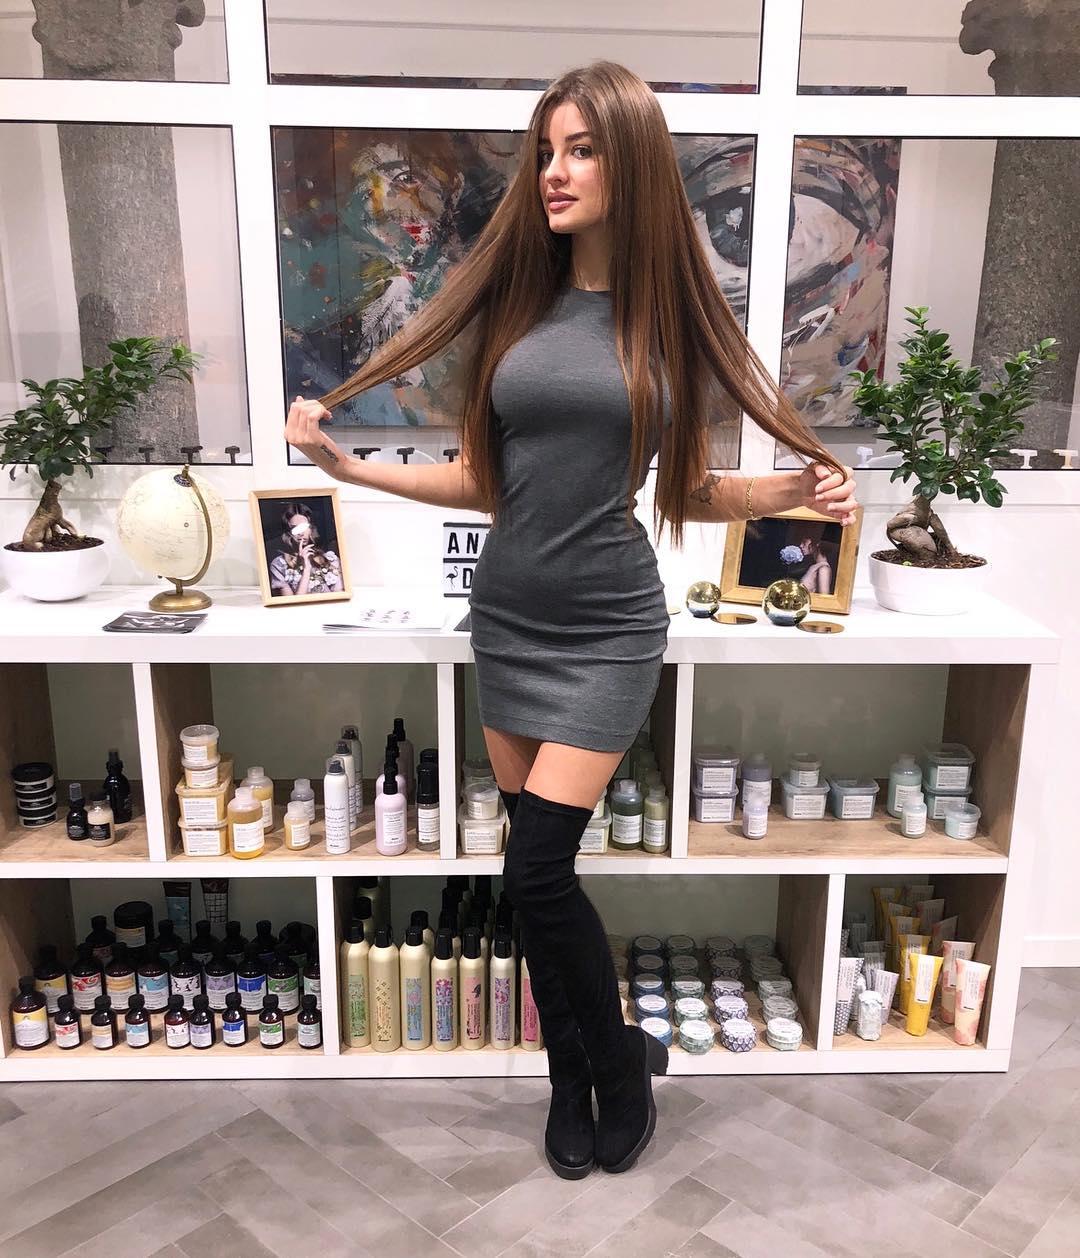 Elena-Berlato-Wallpapers-Insta-Fit-Bio-2